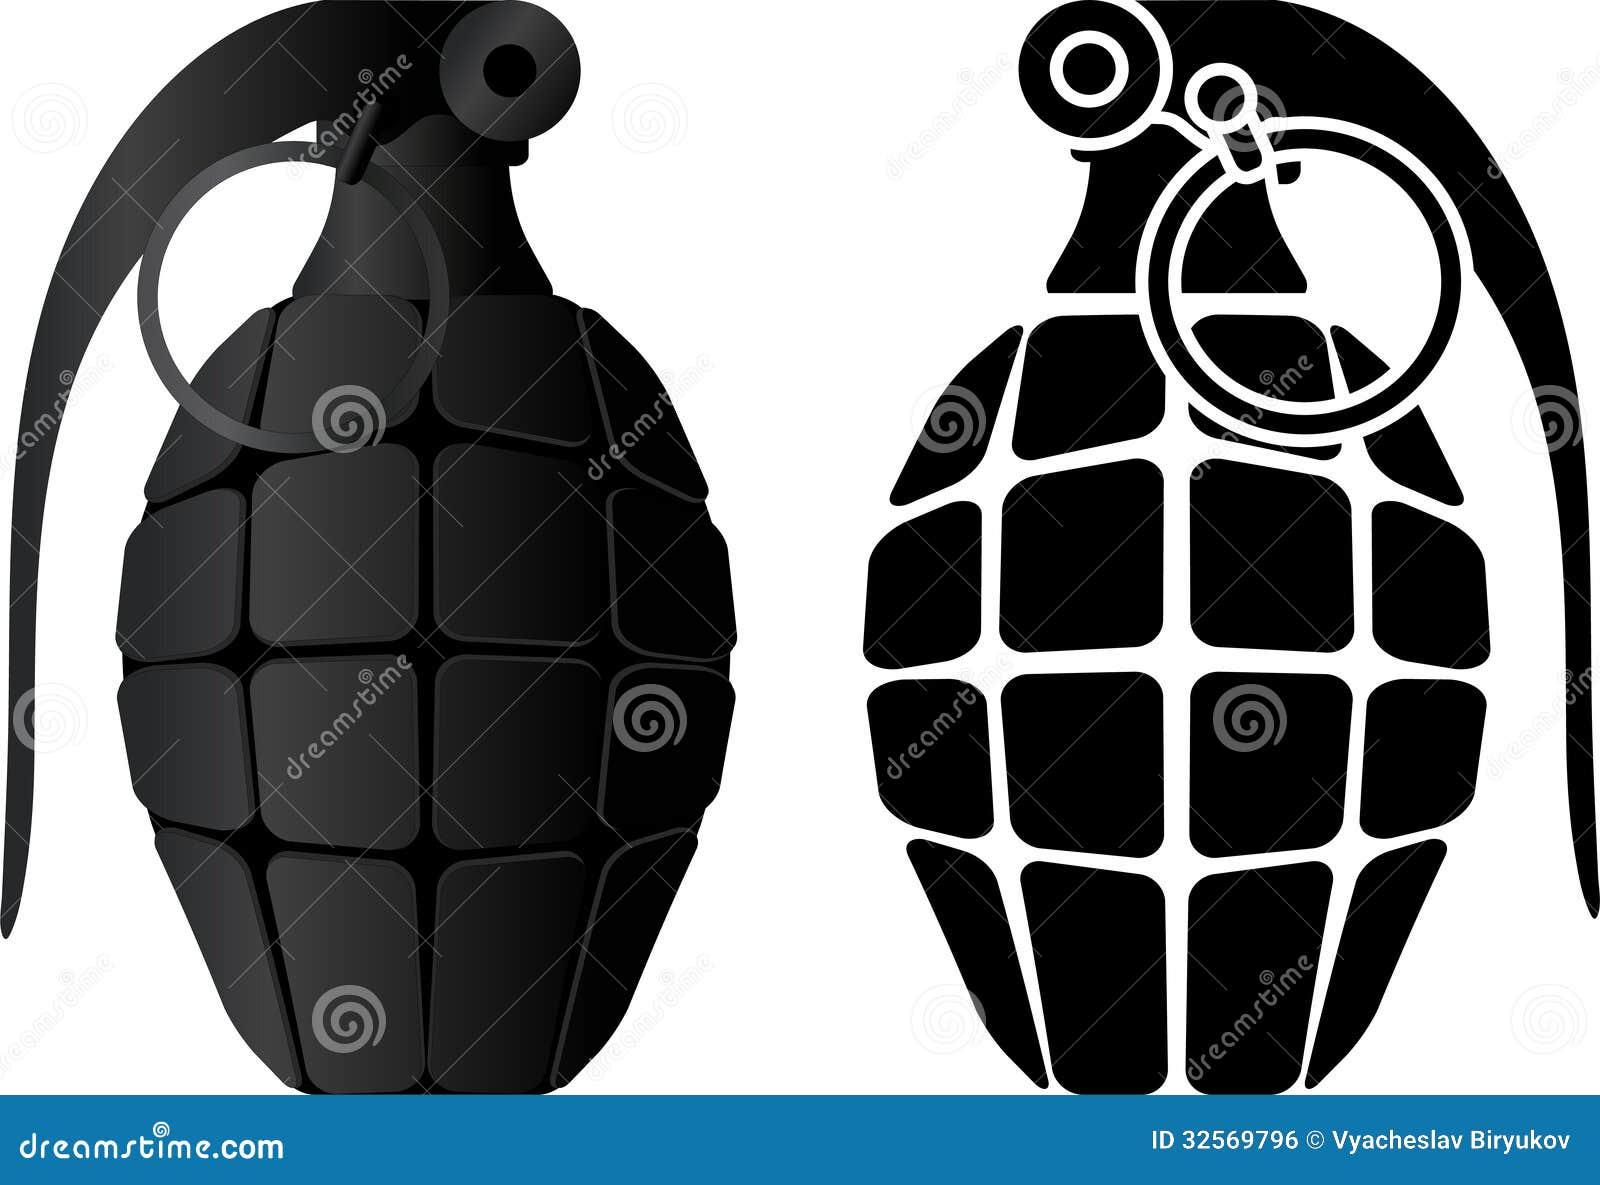 Grenade And Grenade Stencil Royalty Free Stock Image